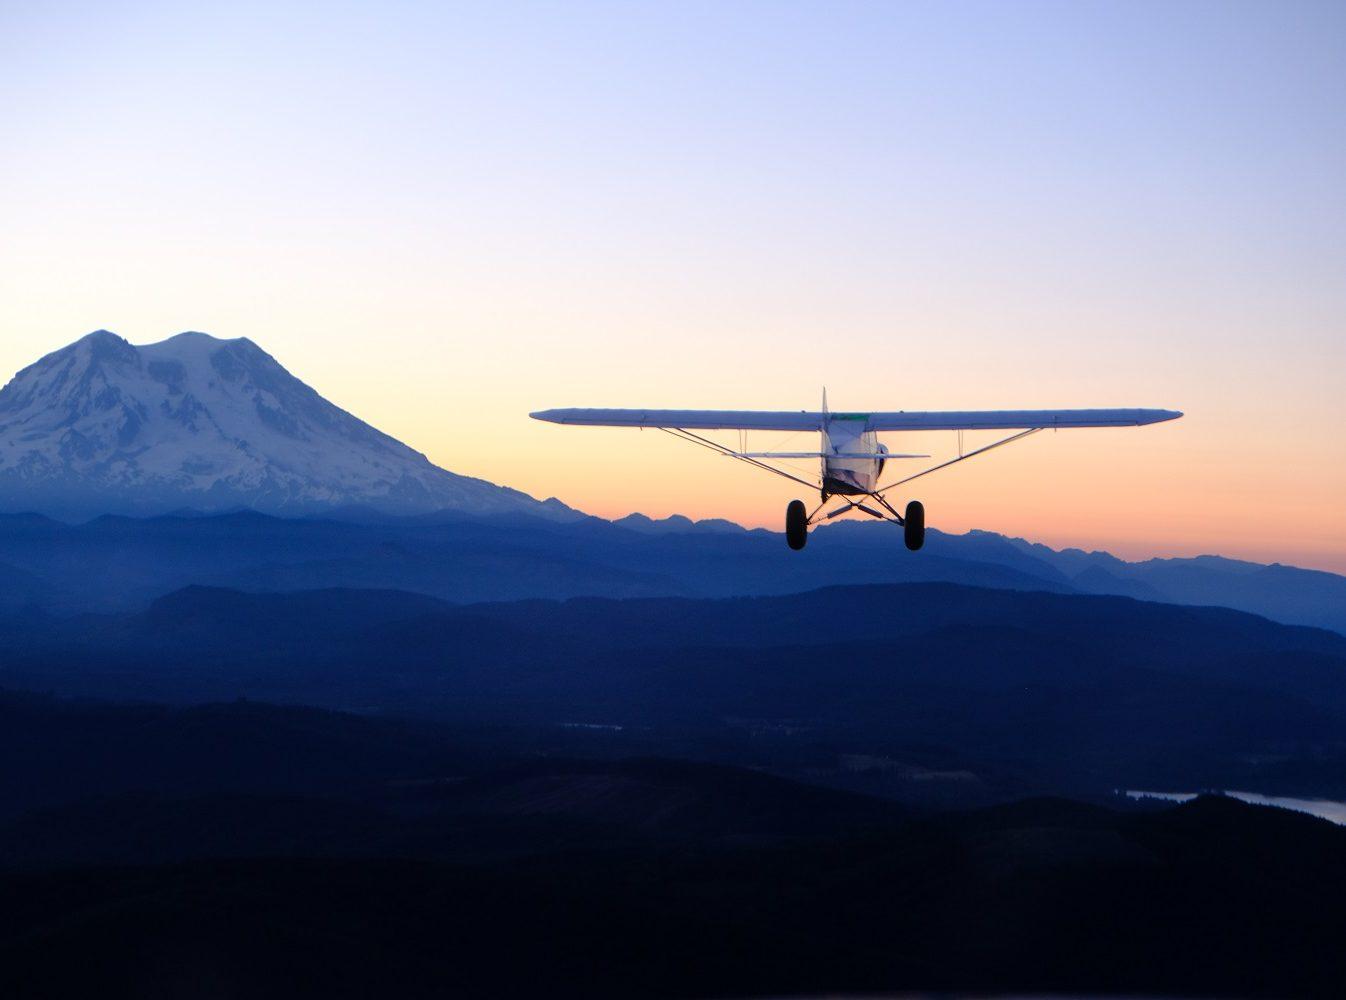 W142 Plane Sunset